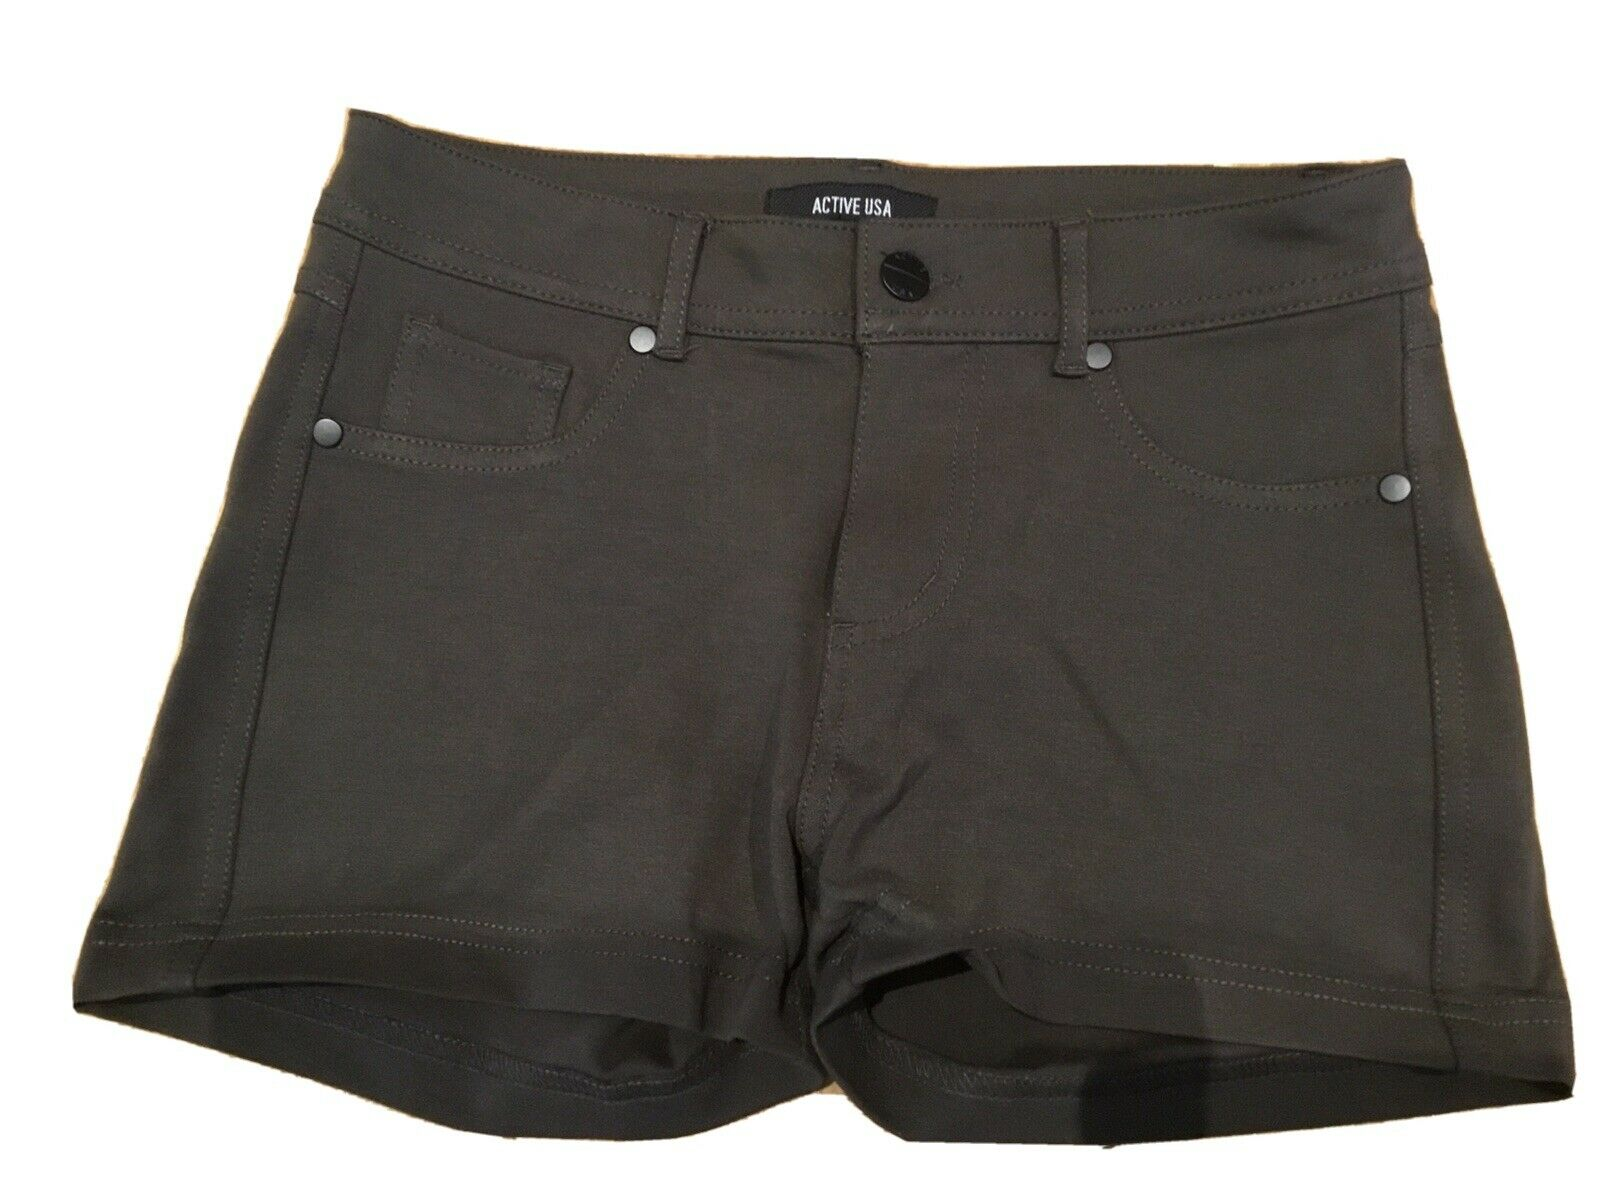 Active USA Hot Pants kurze Hose khaki Gr. S Damen Mädchen NEU o. Etikett